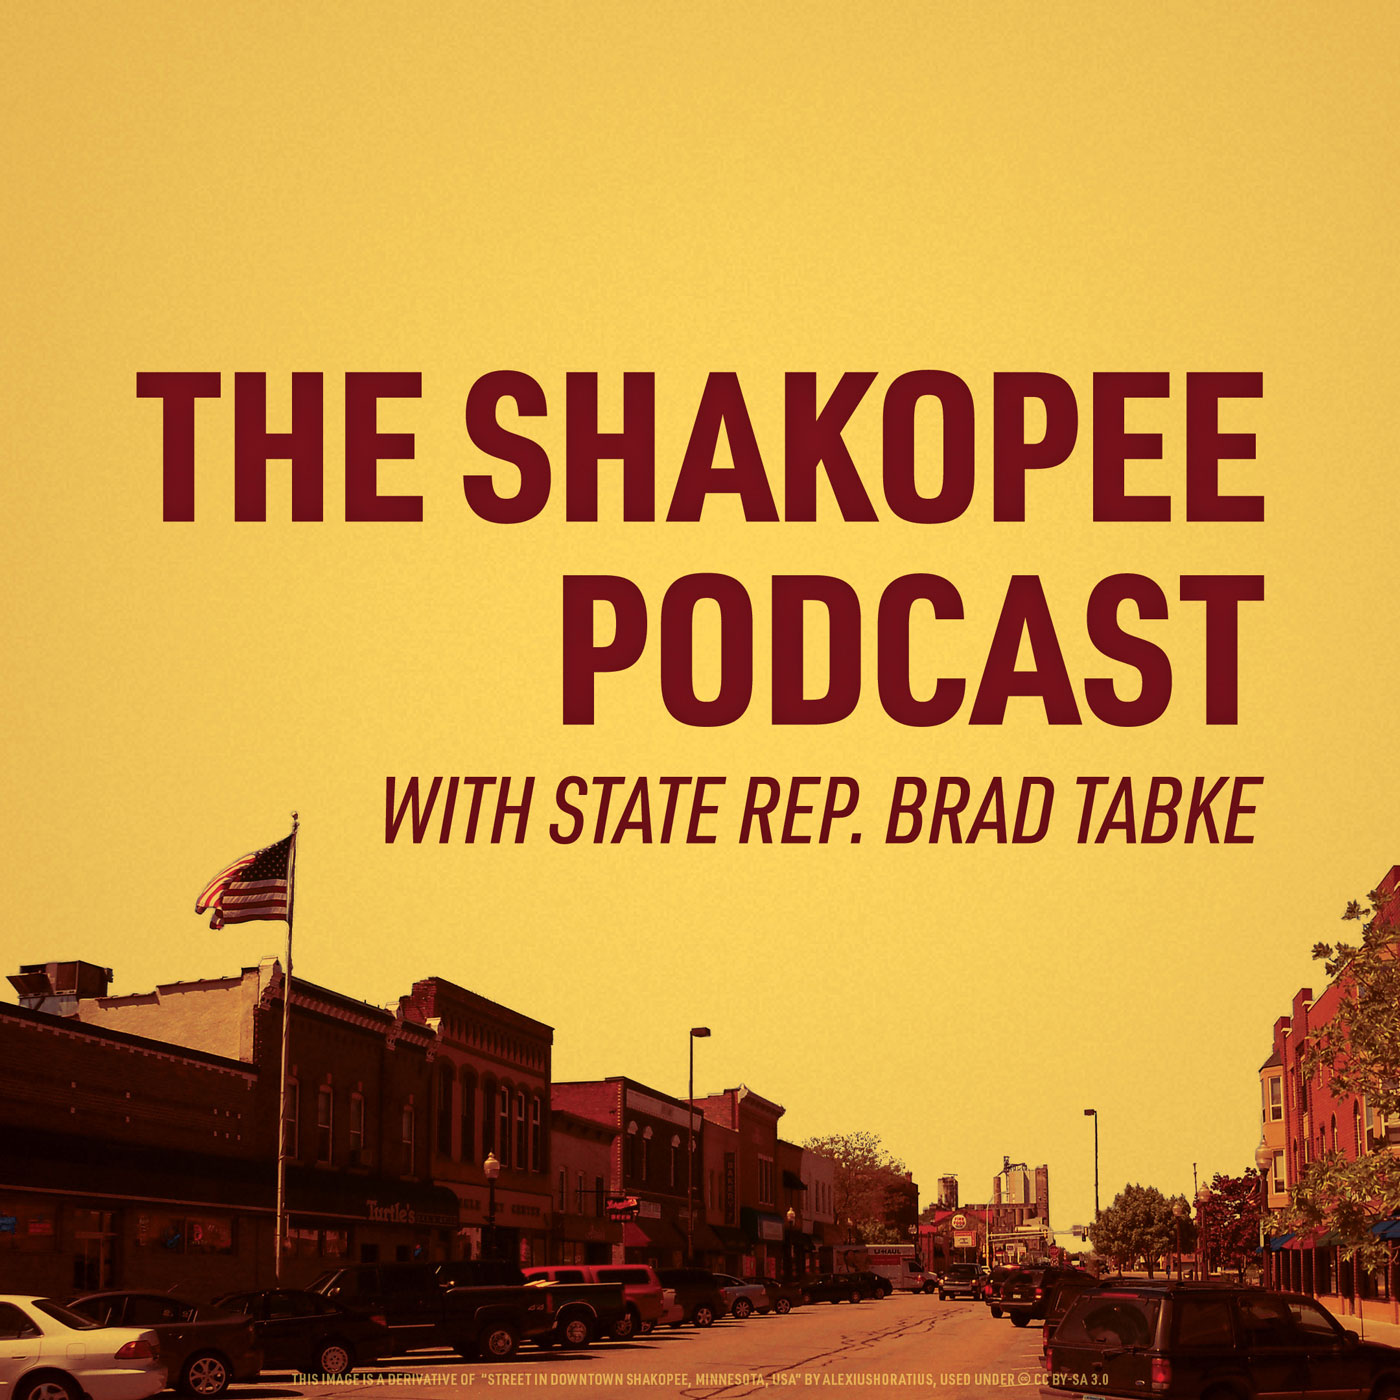 The Shakopee Podcast show art